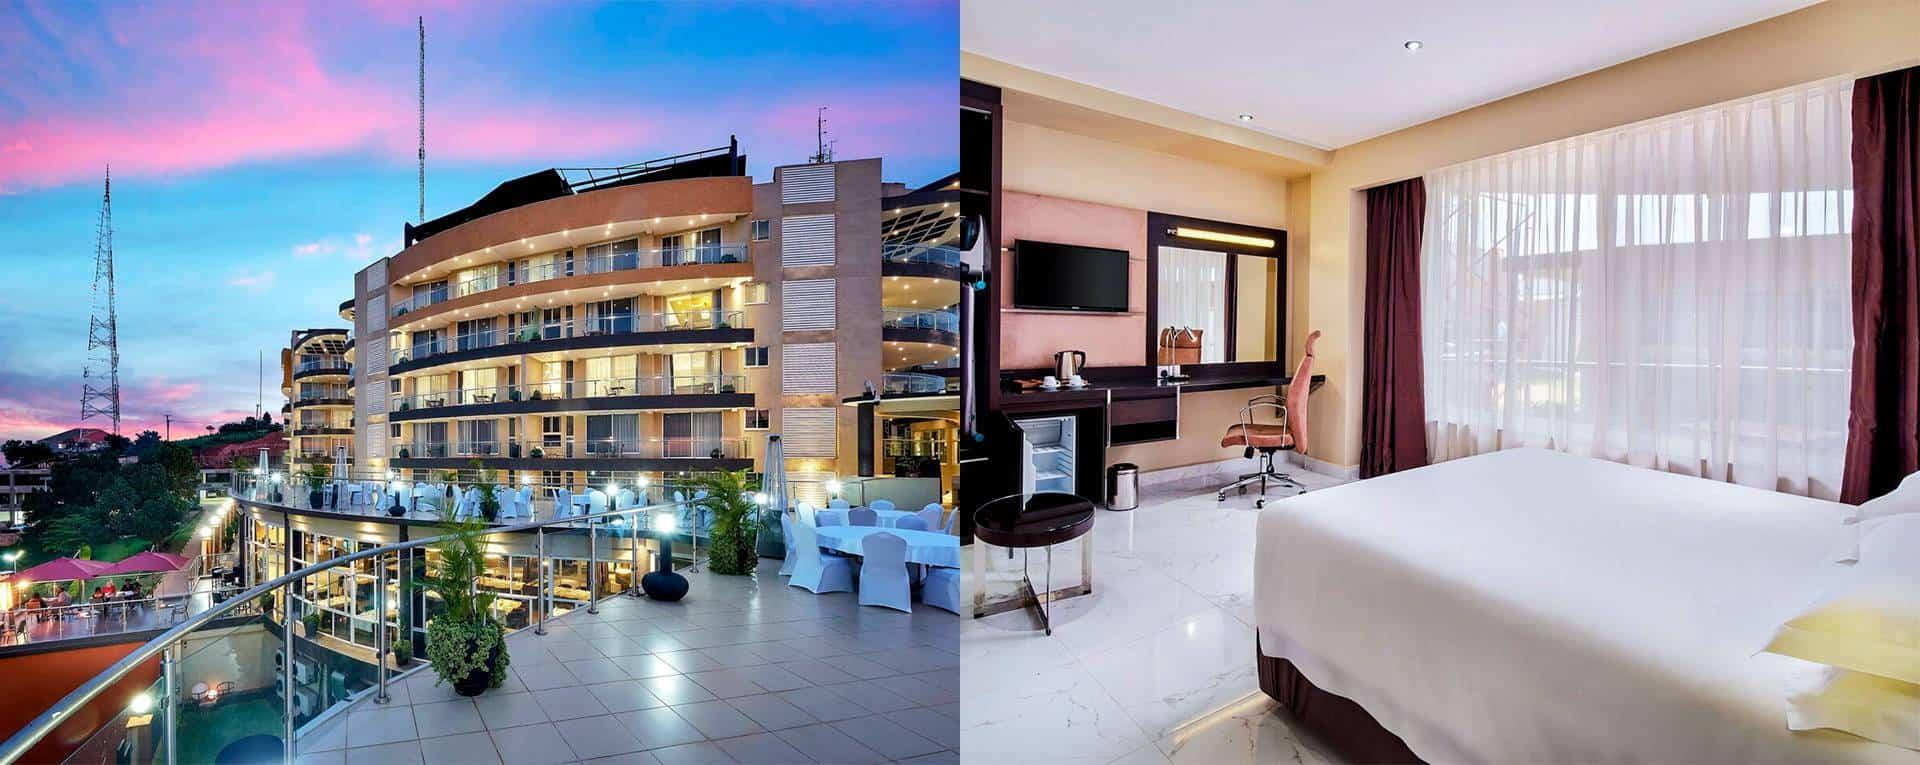 Protea Hotel Kampala Skyz